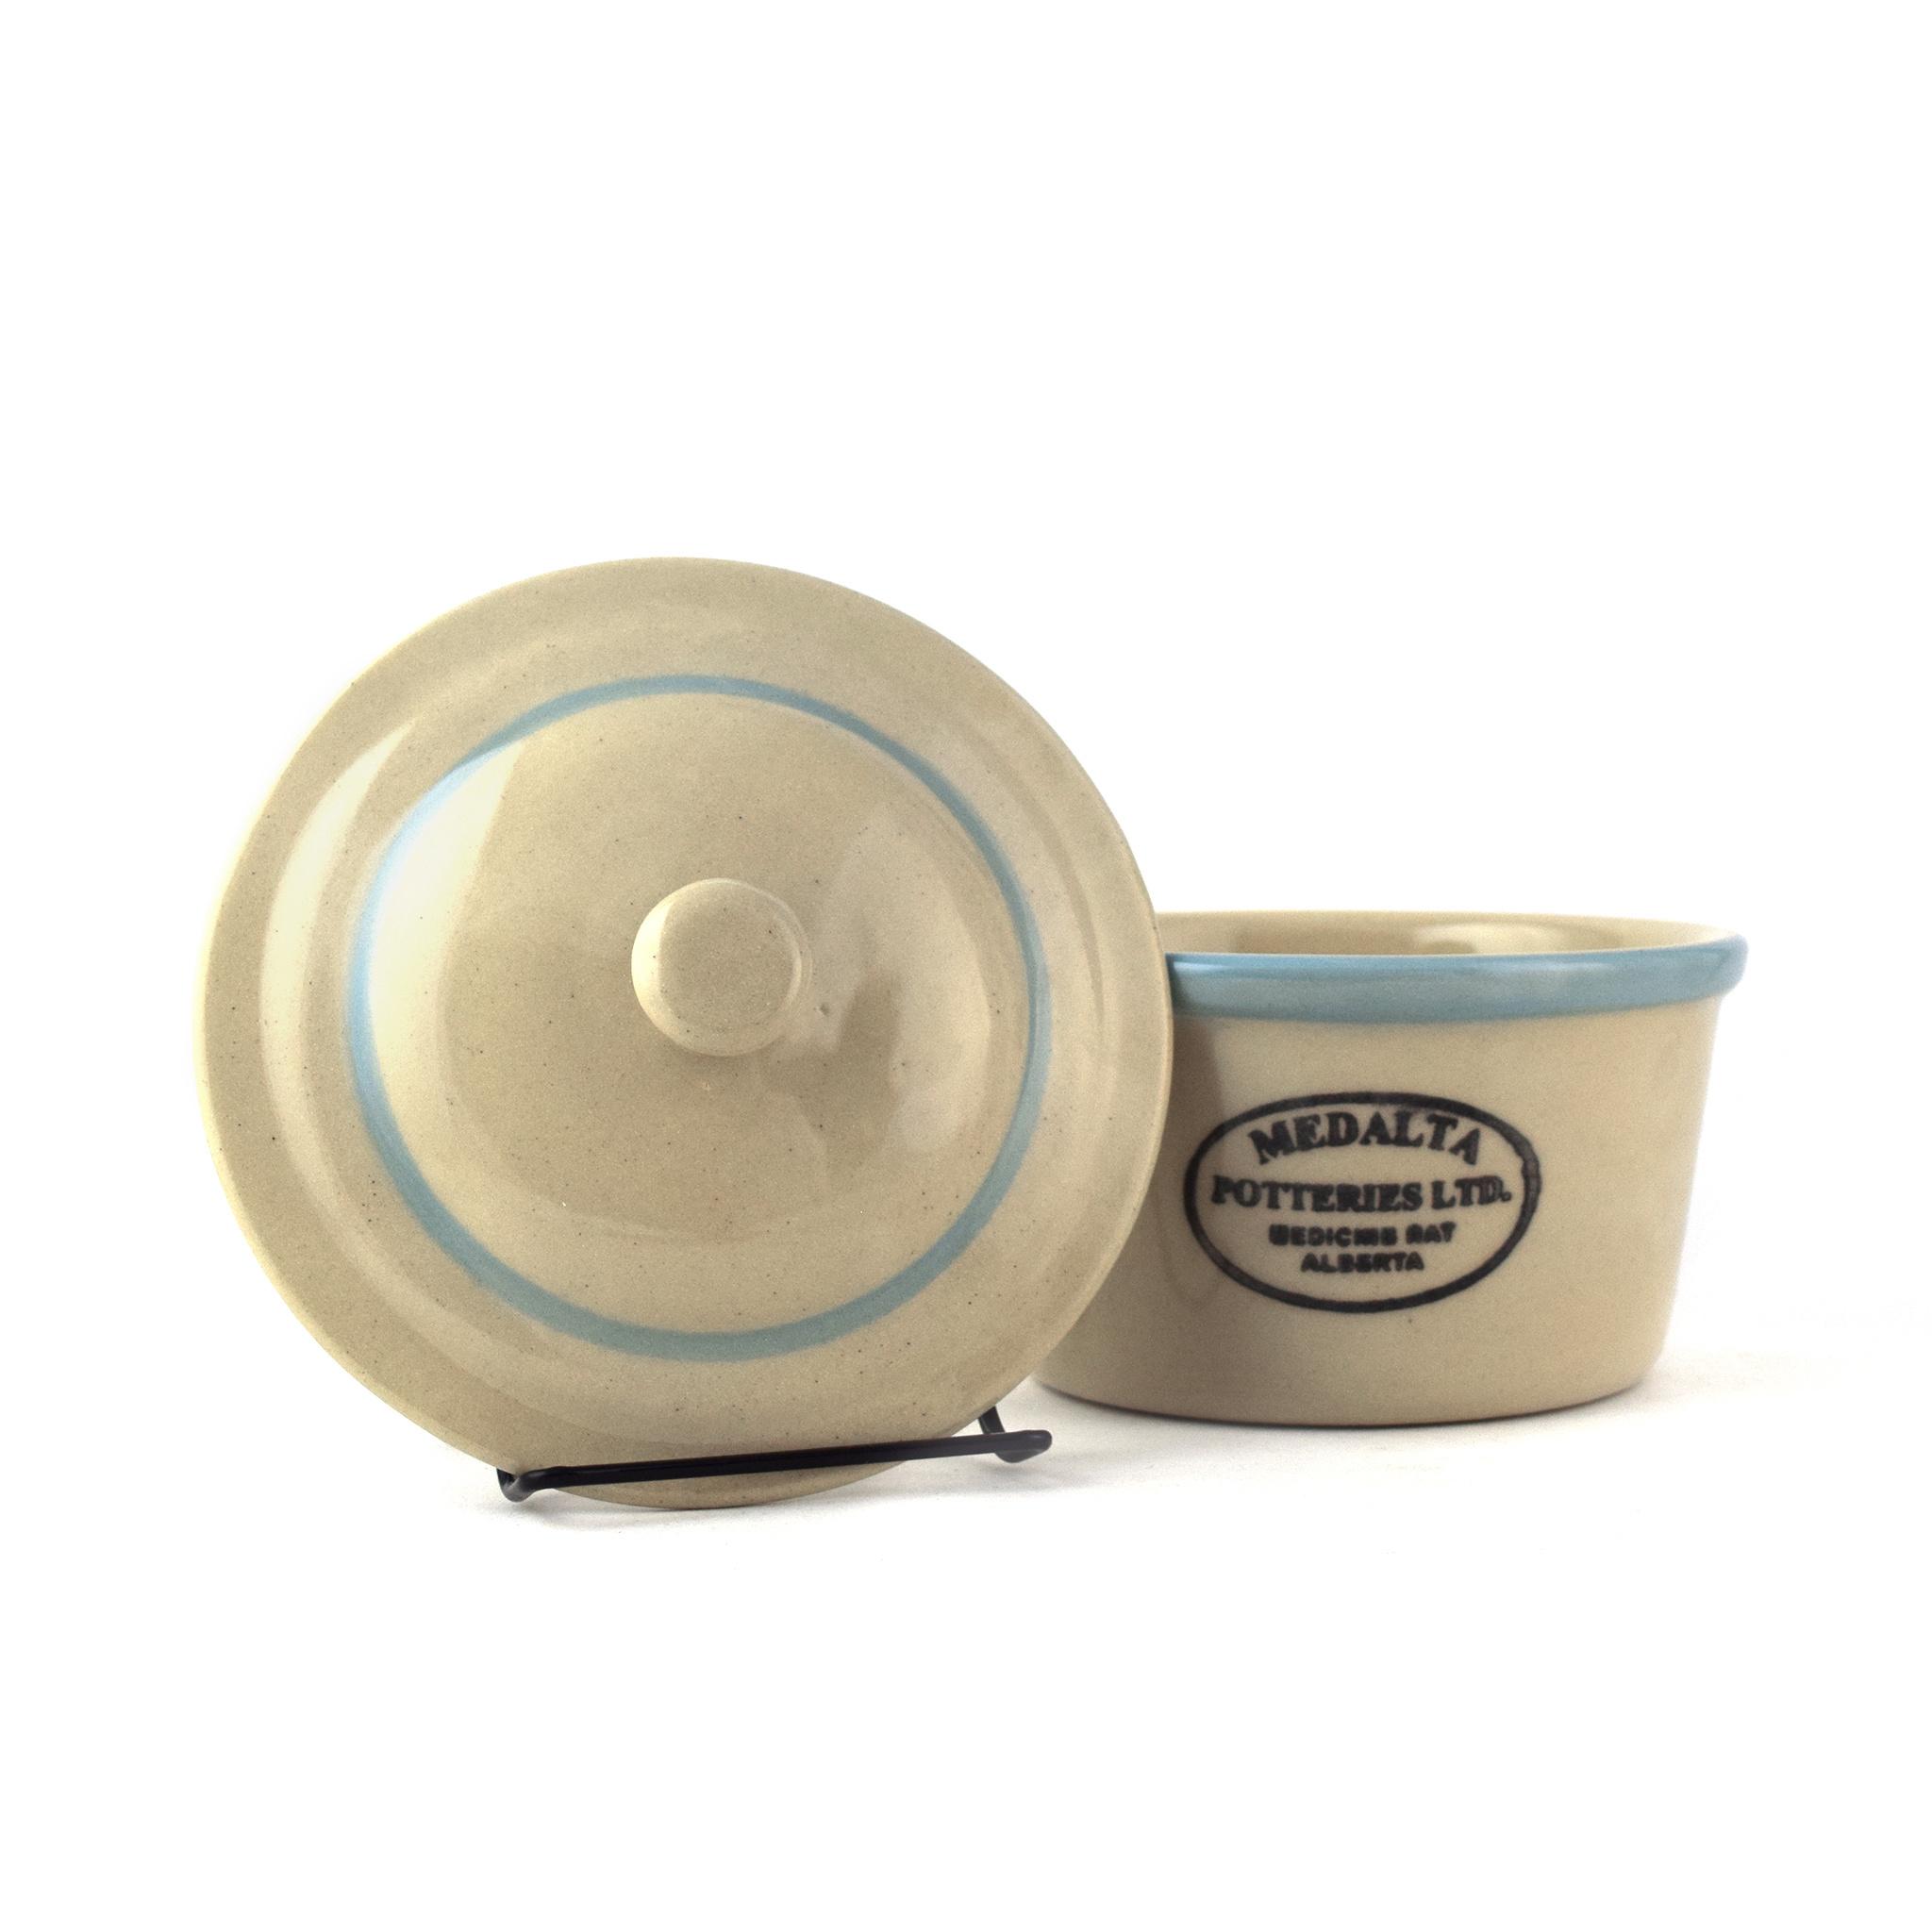 Medalta Ware Reproduction Casserole Dish Set